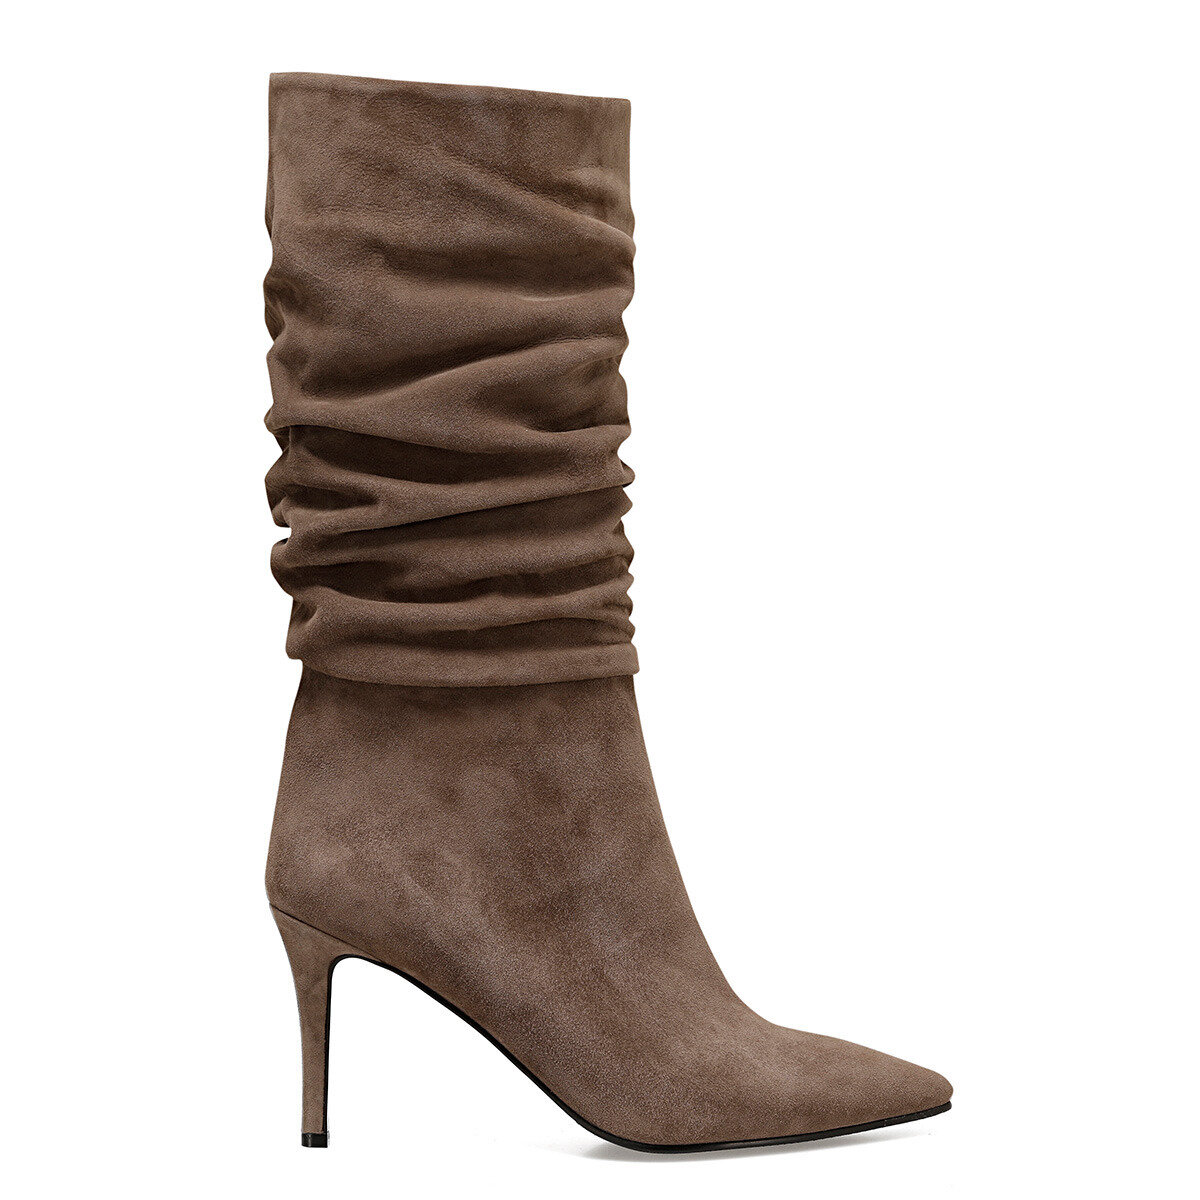 MOLLY Vizon Kadın Topuklu Çizme